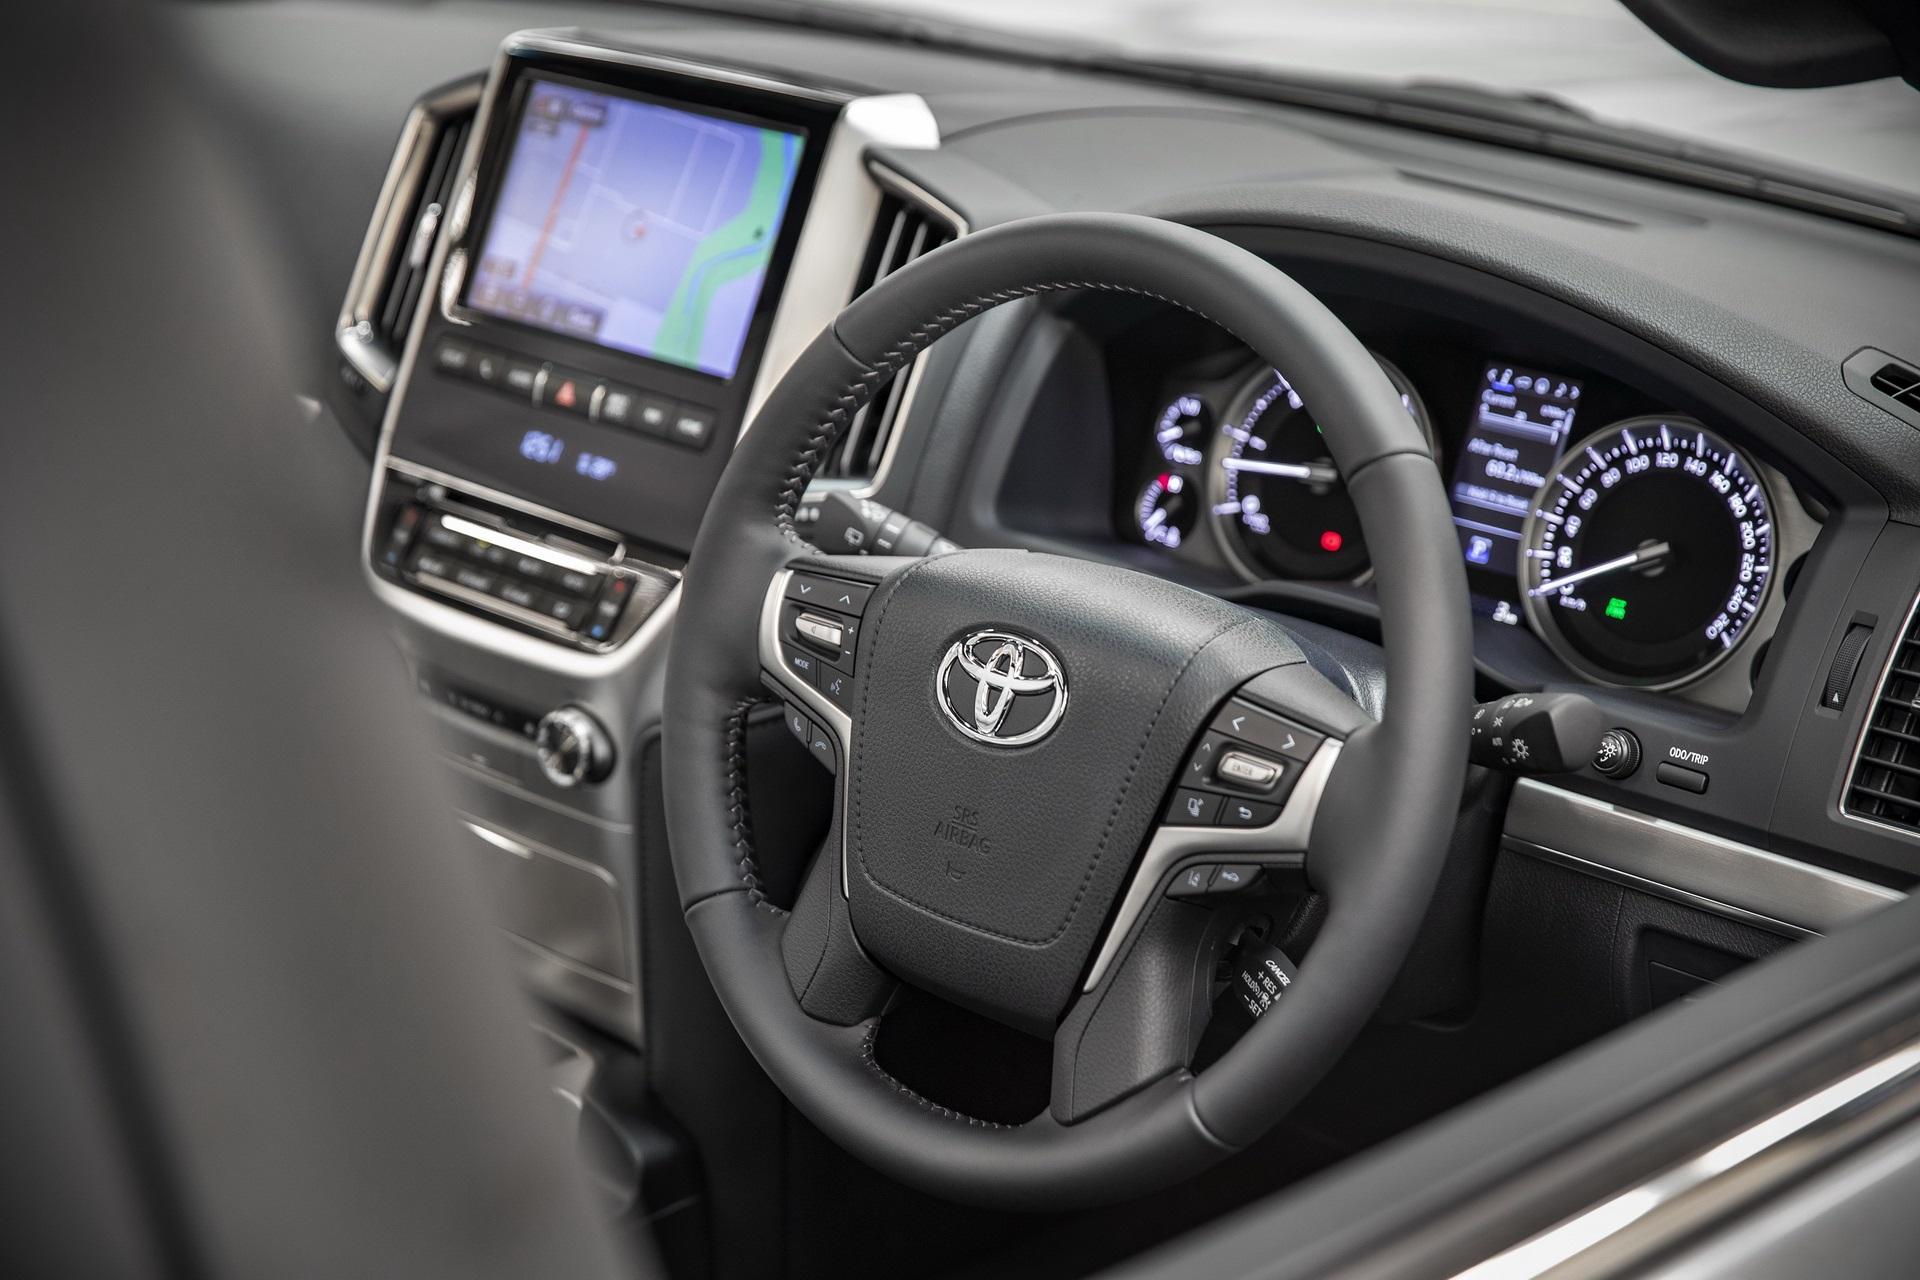 2020-toyota-laund-cruiser-horizon-sahara-edition-australia-6.jpg